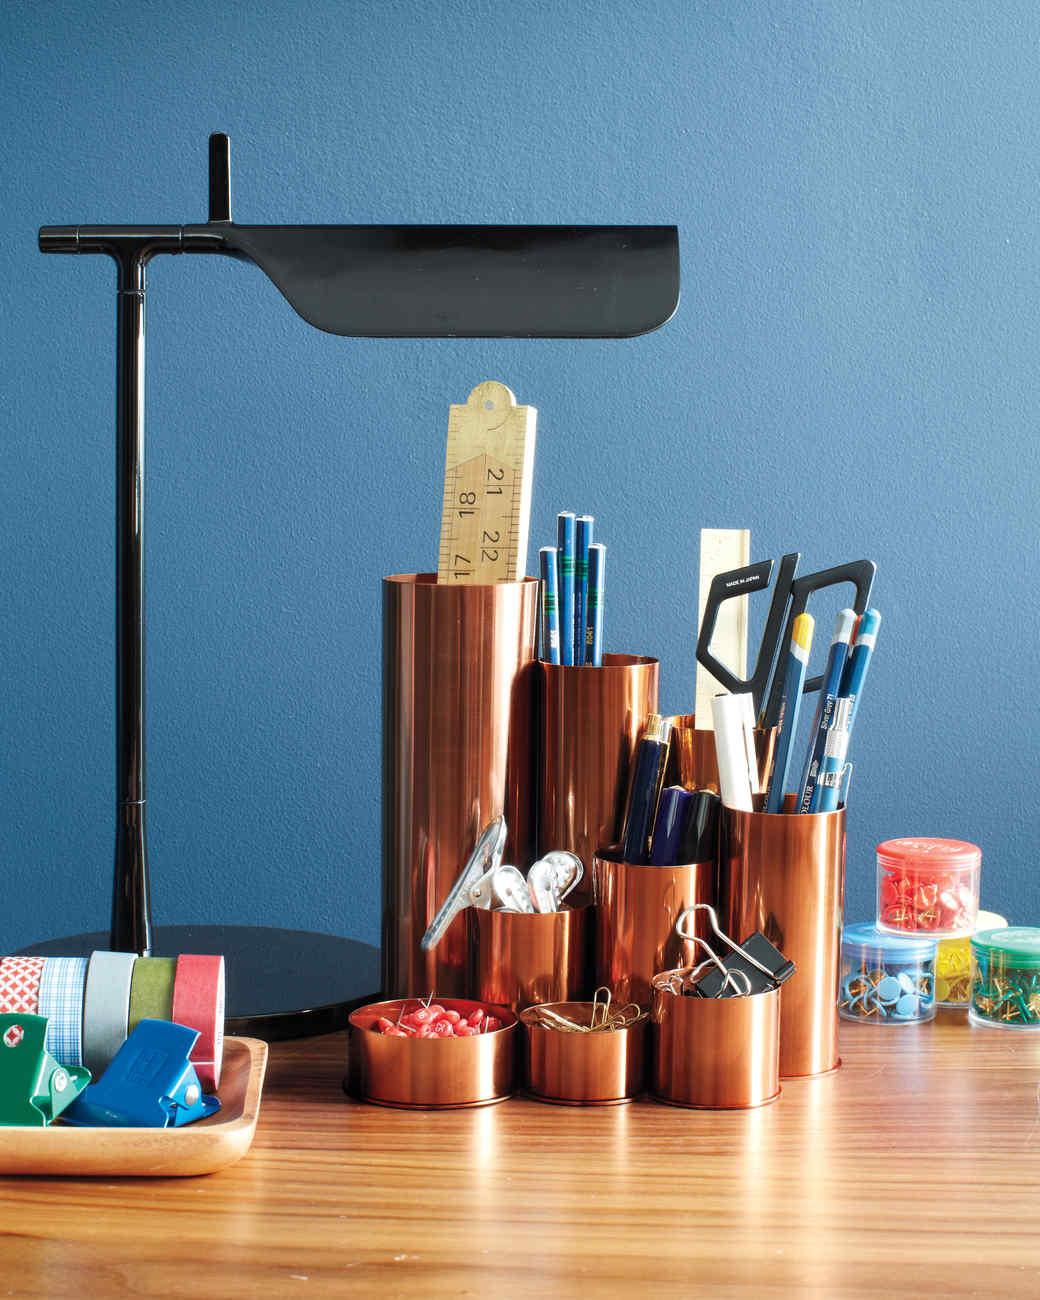 desk-detail-supplies-238-md110720.jpg